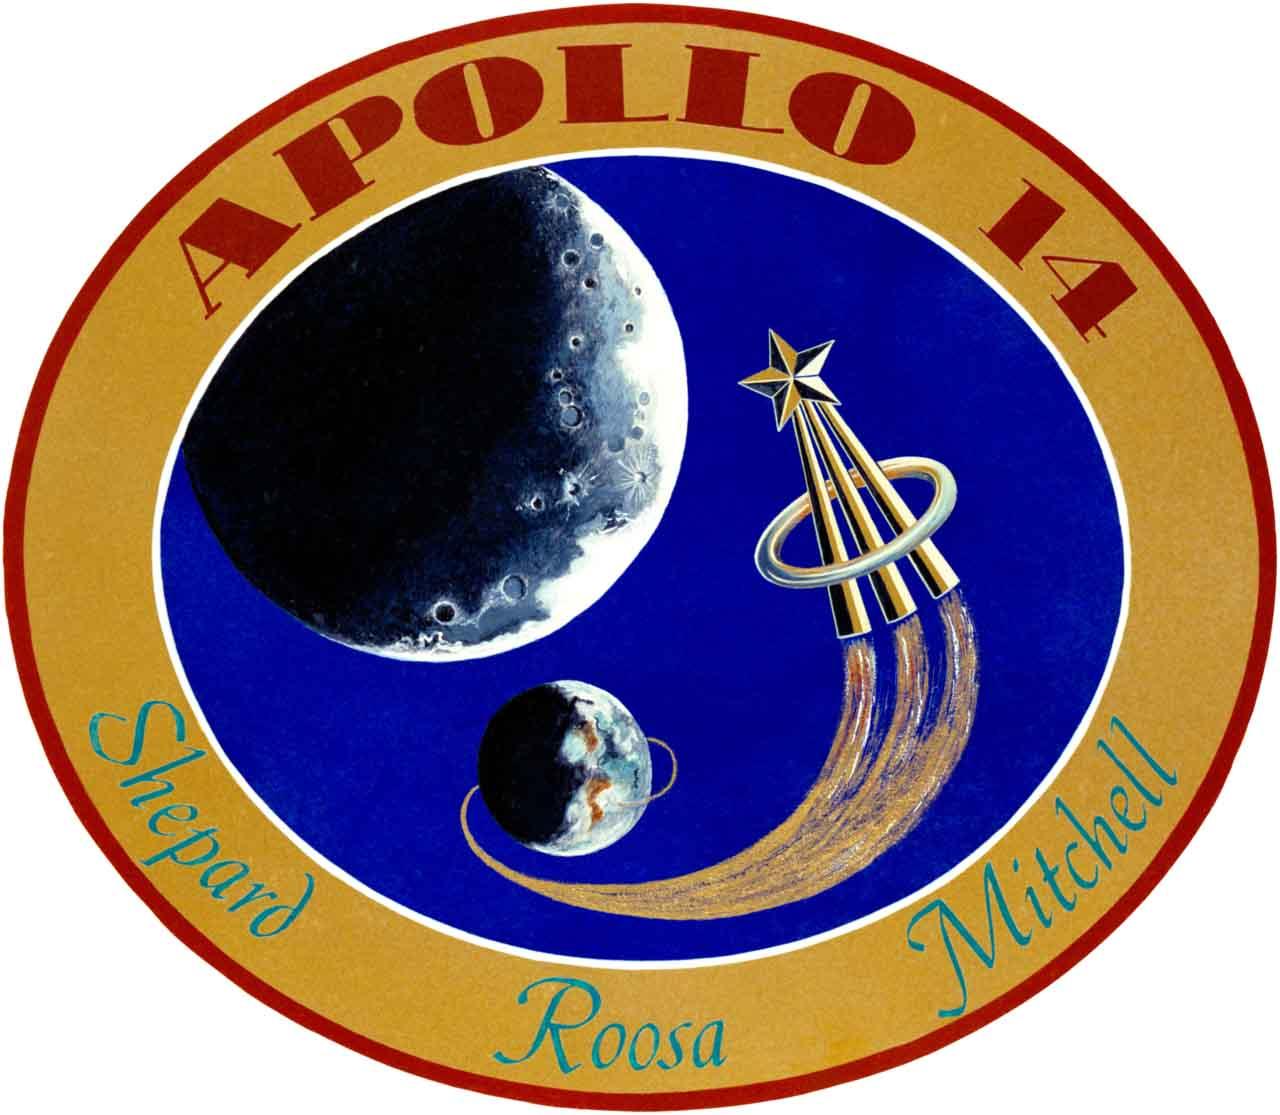 سالروز ماموریت آپولو ۱۴